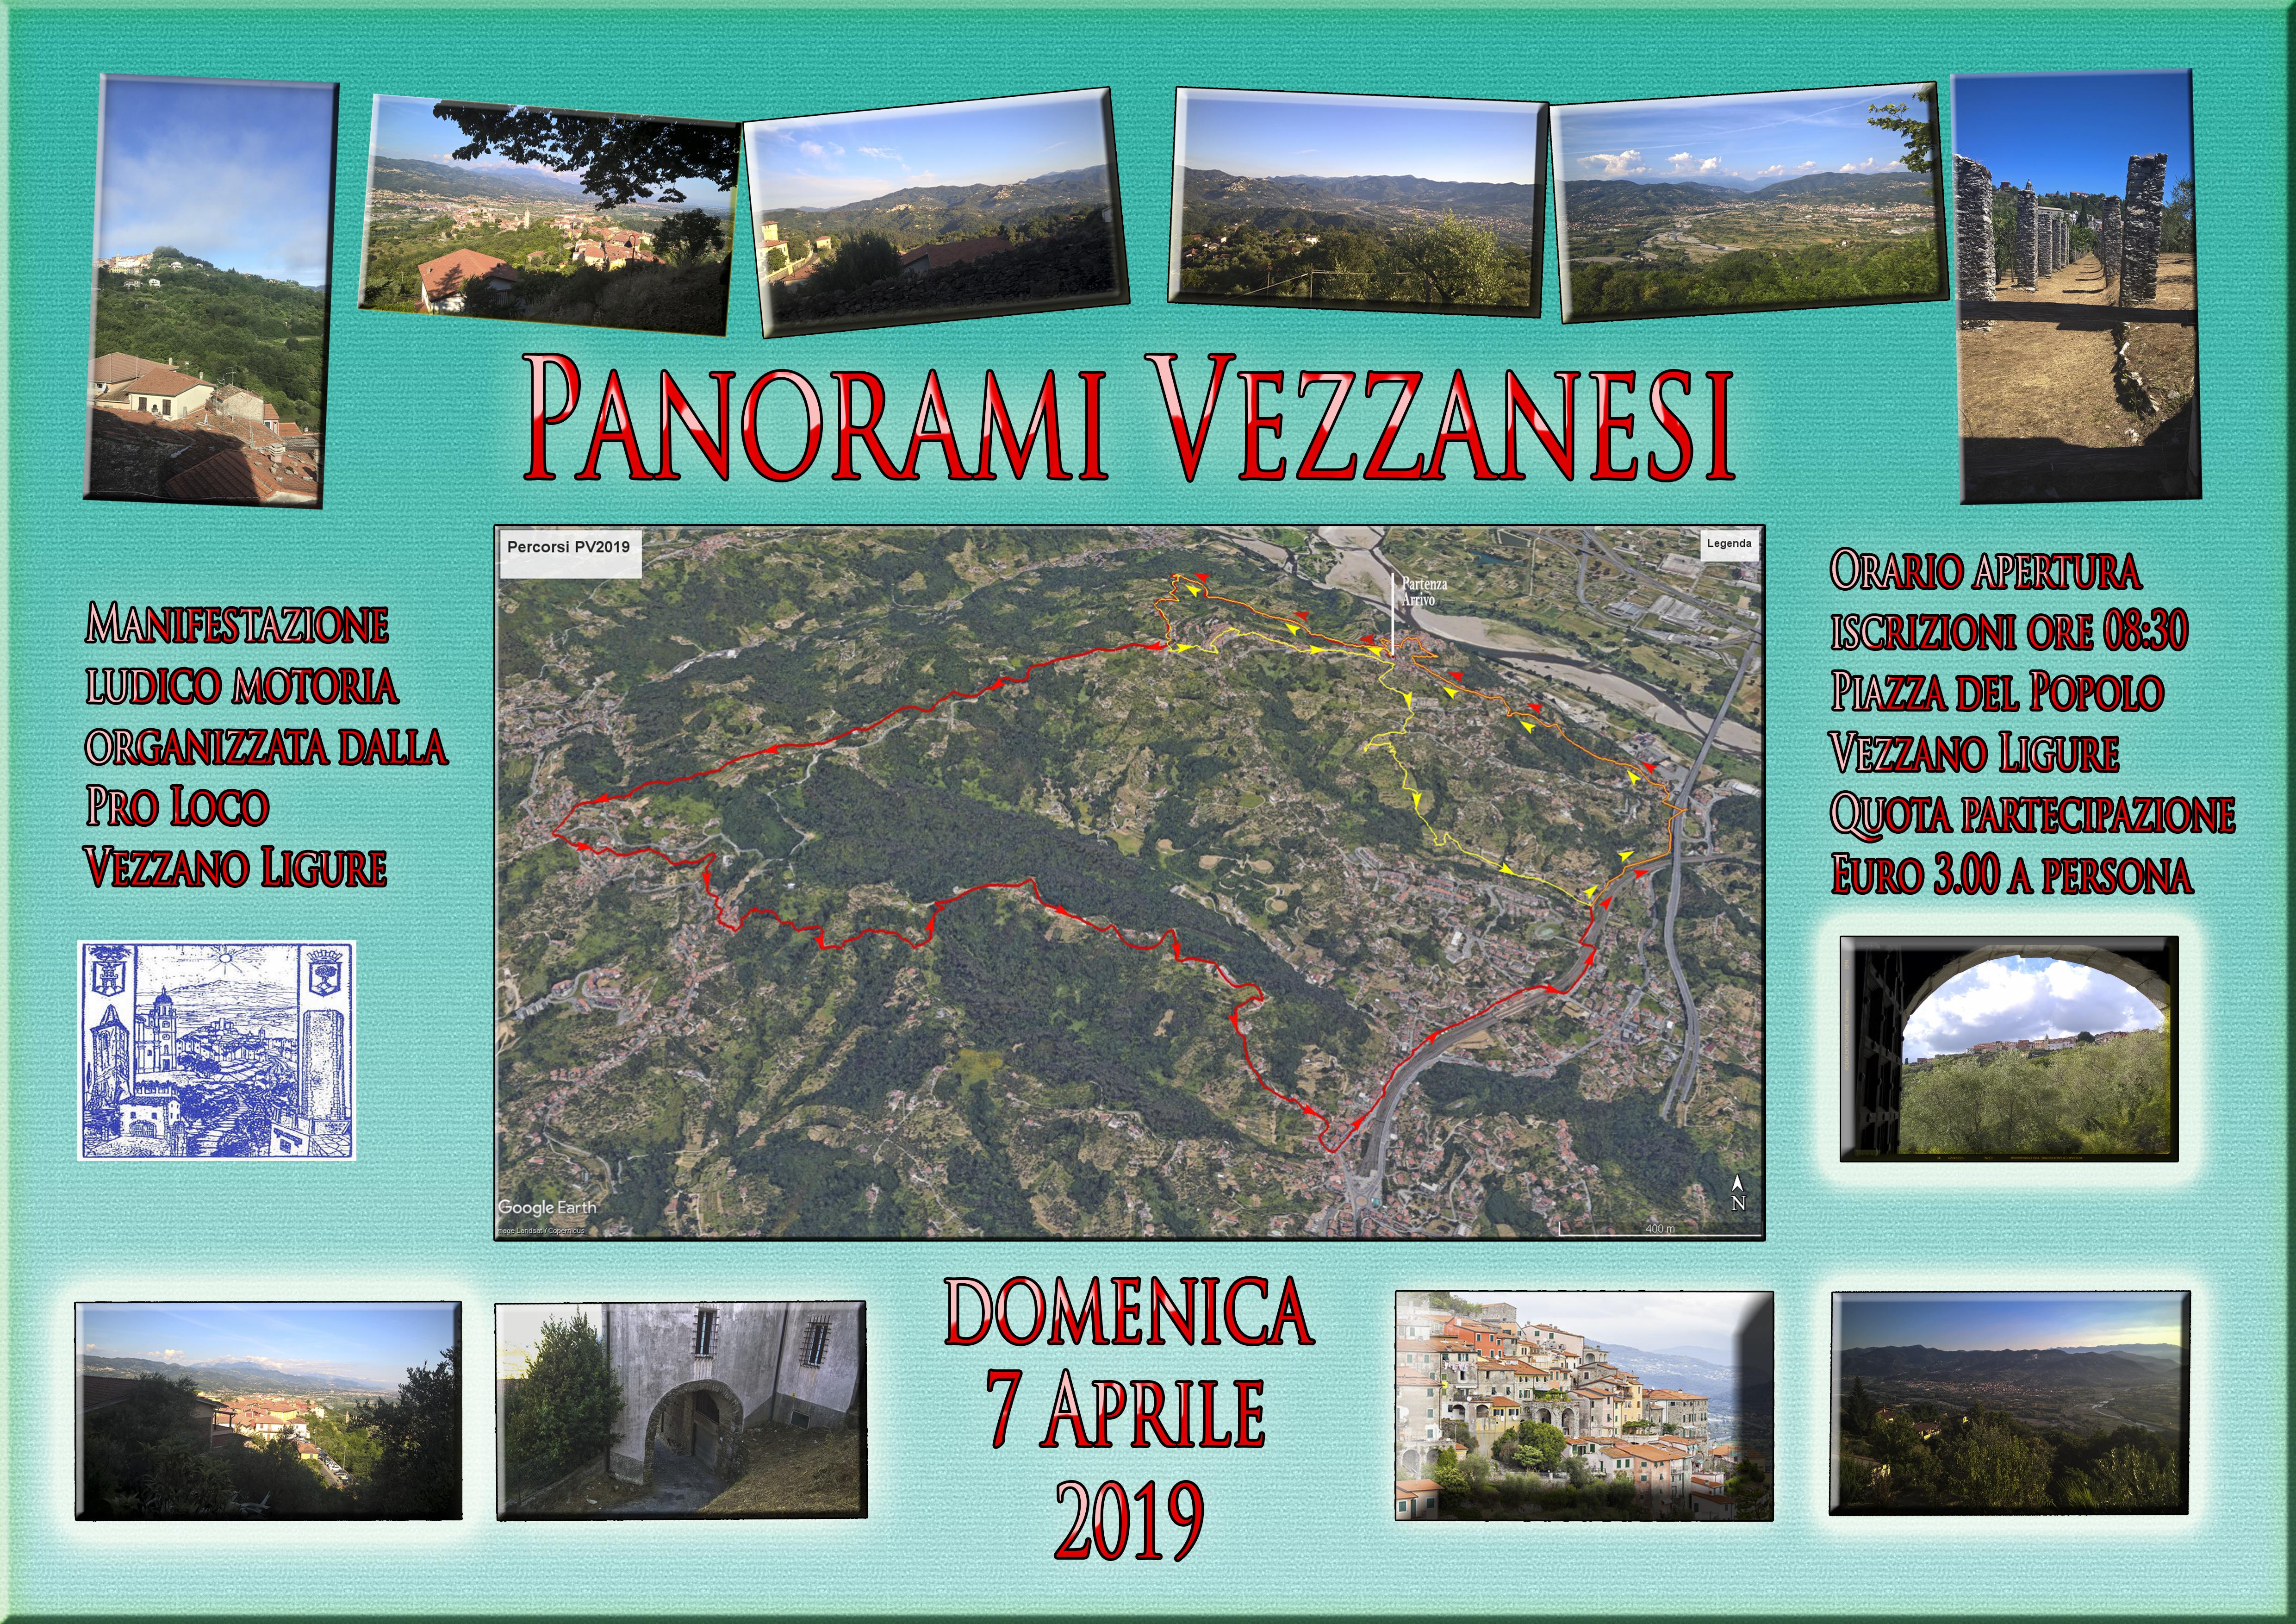 Panorami Vezzanesi Domenica 7 Aprile 2019